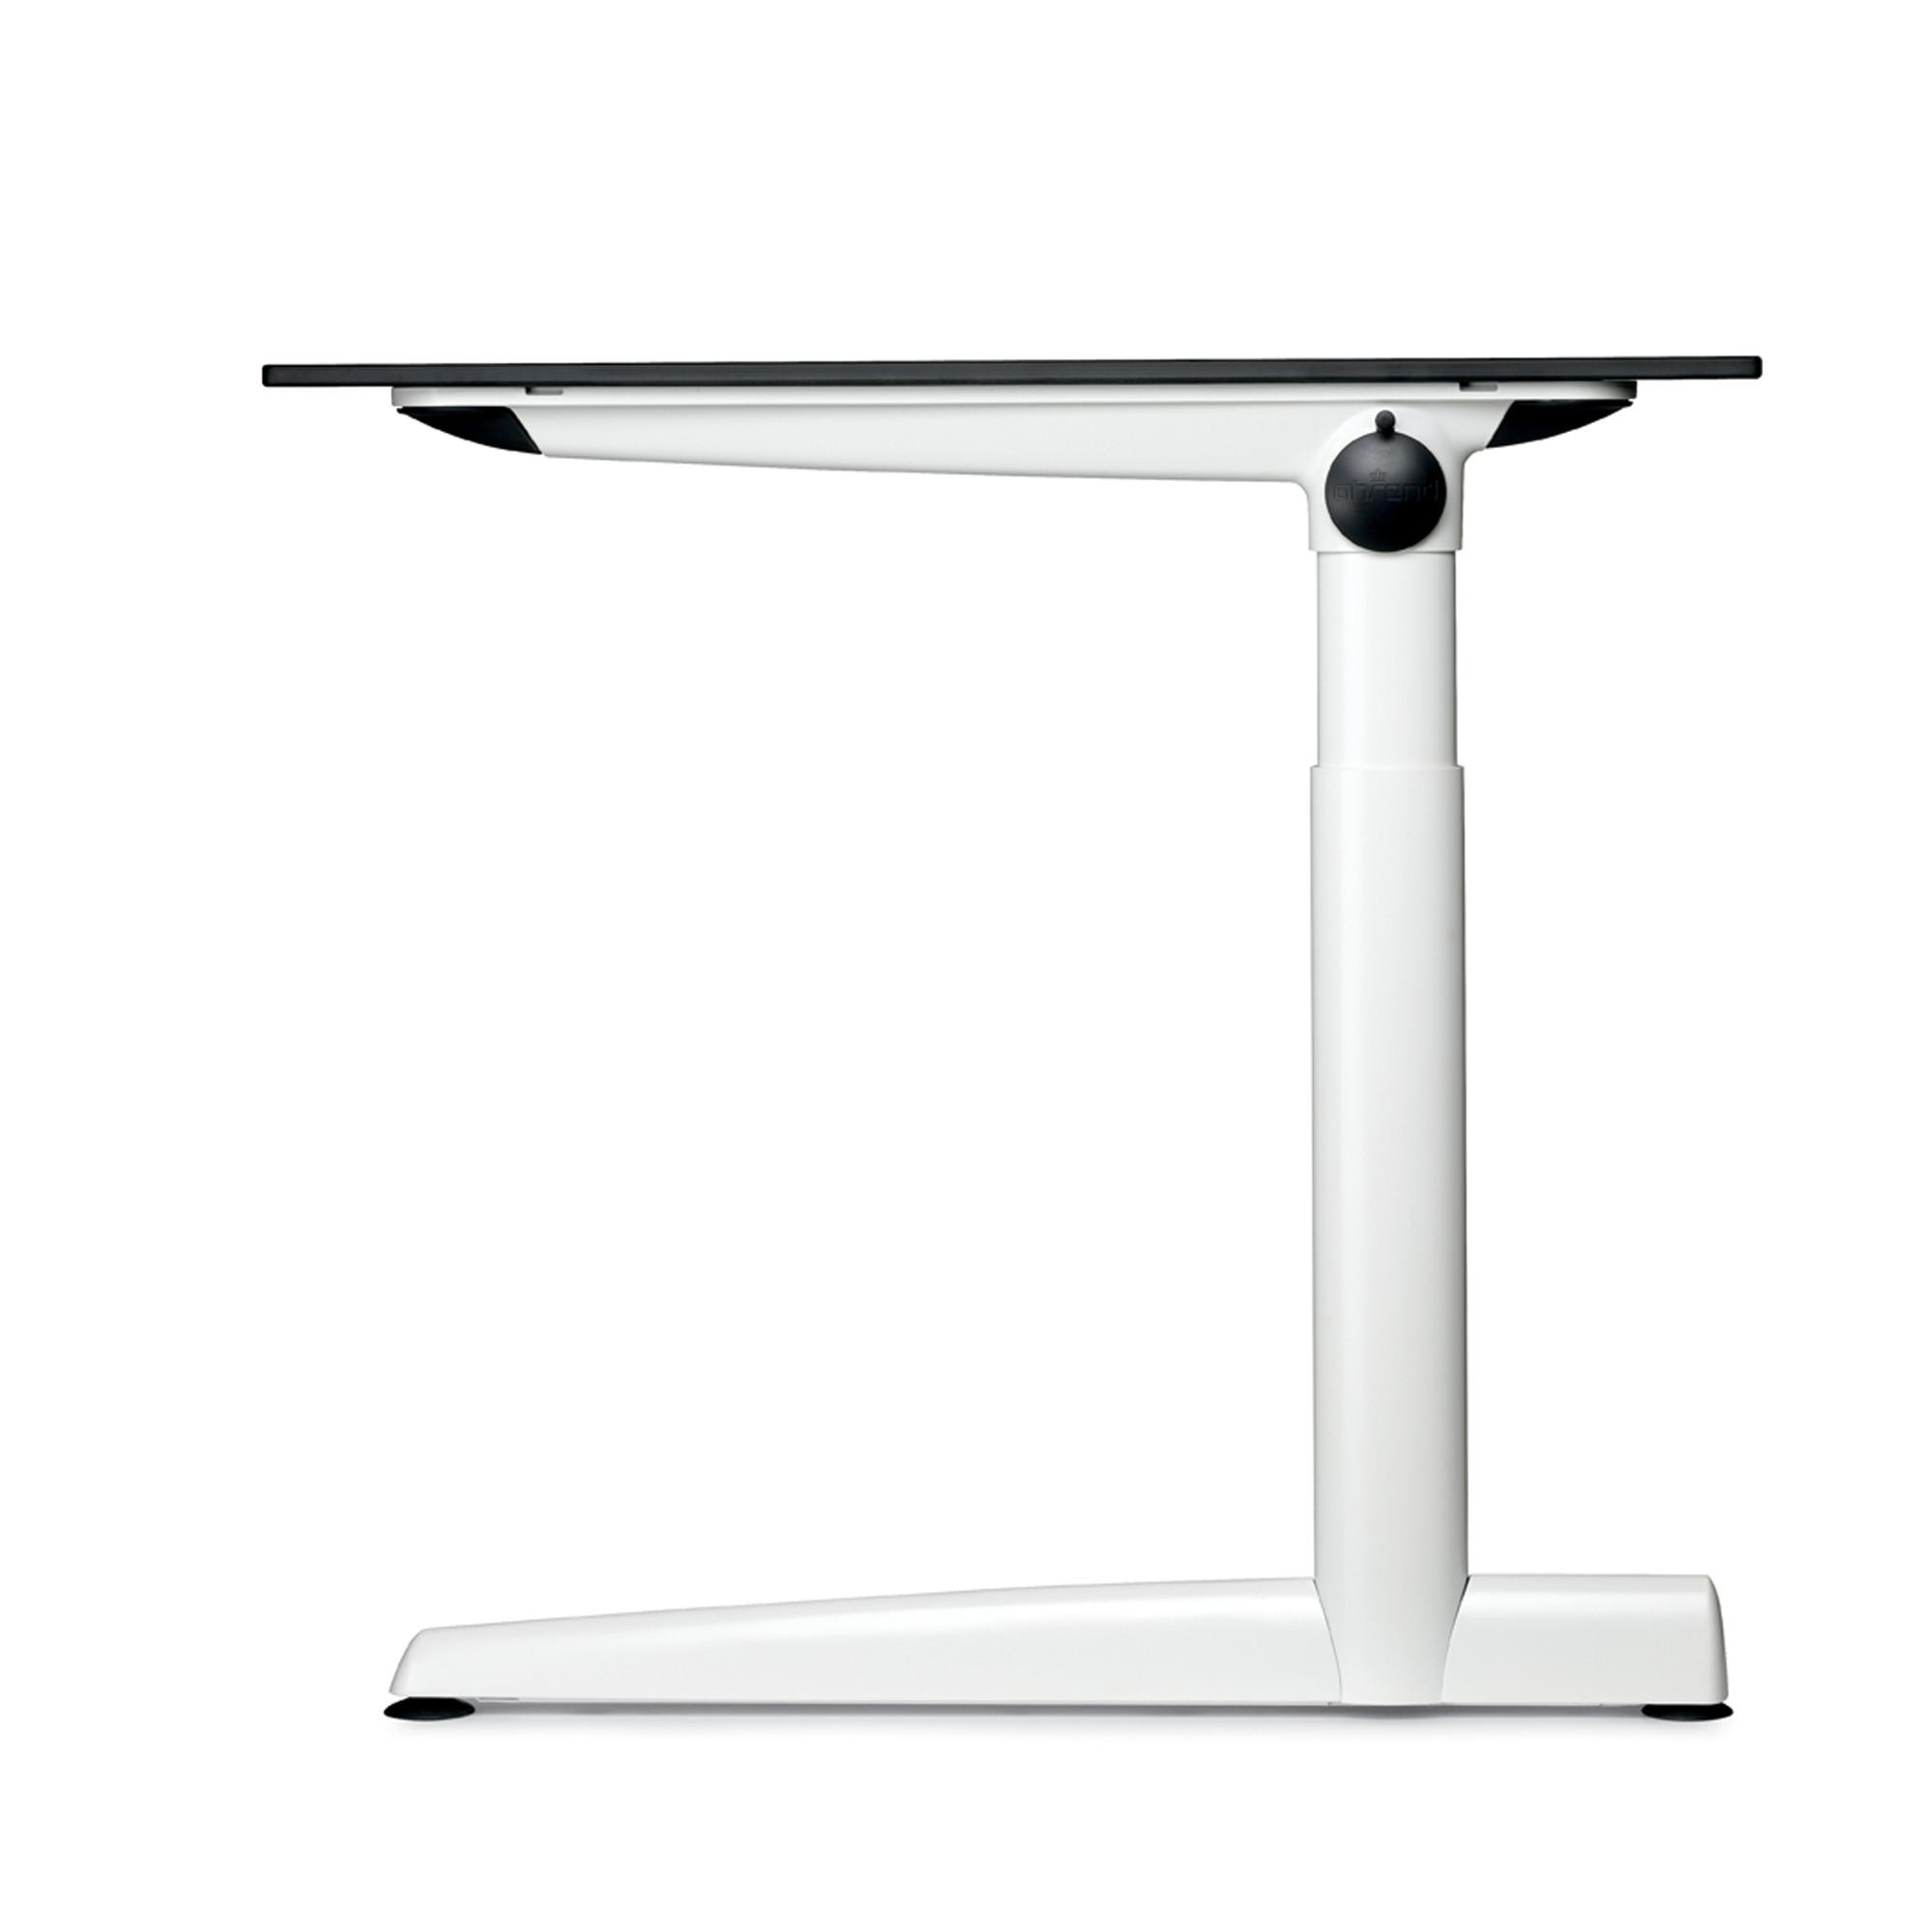 Ahrend 500 Single Desks